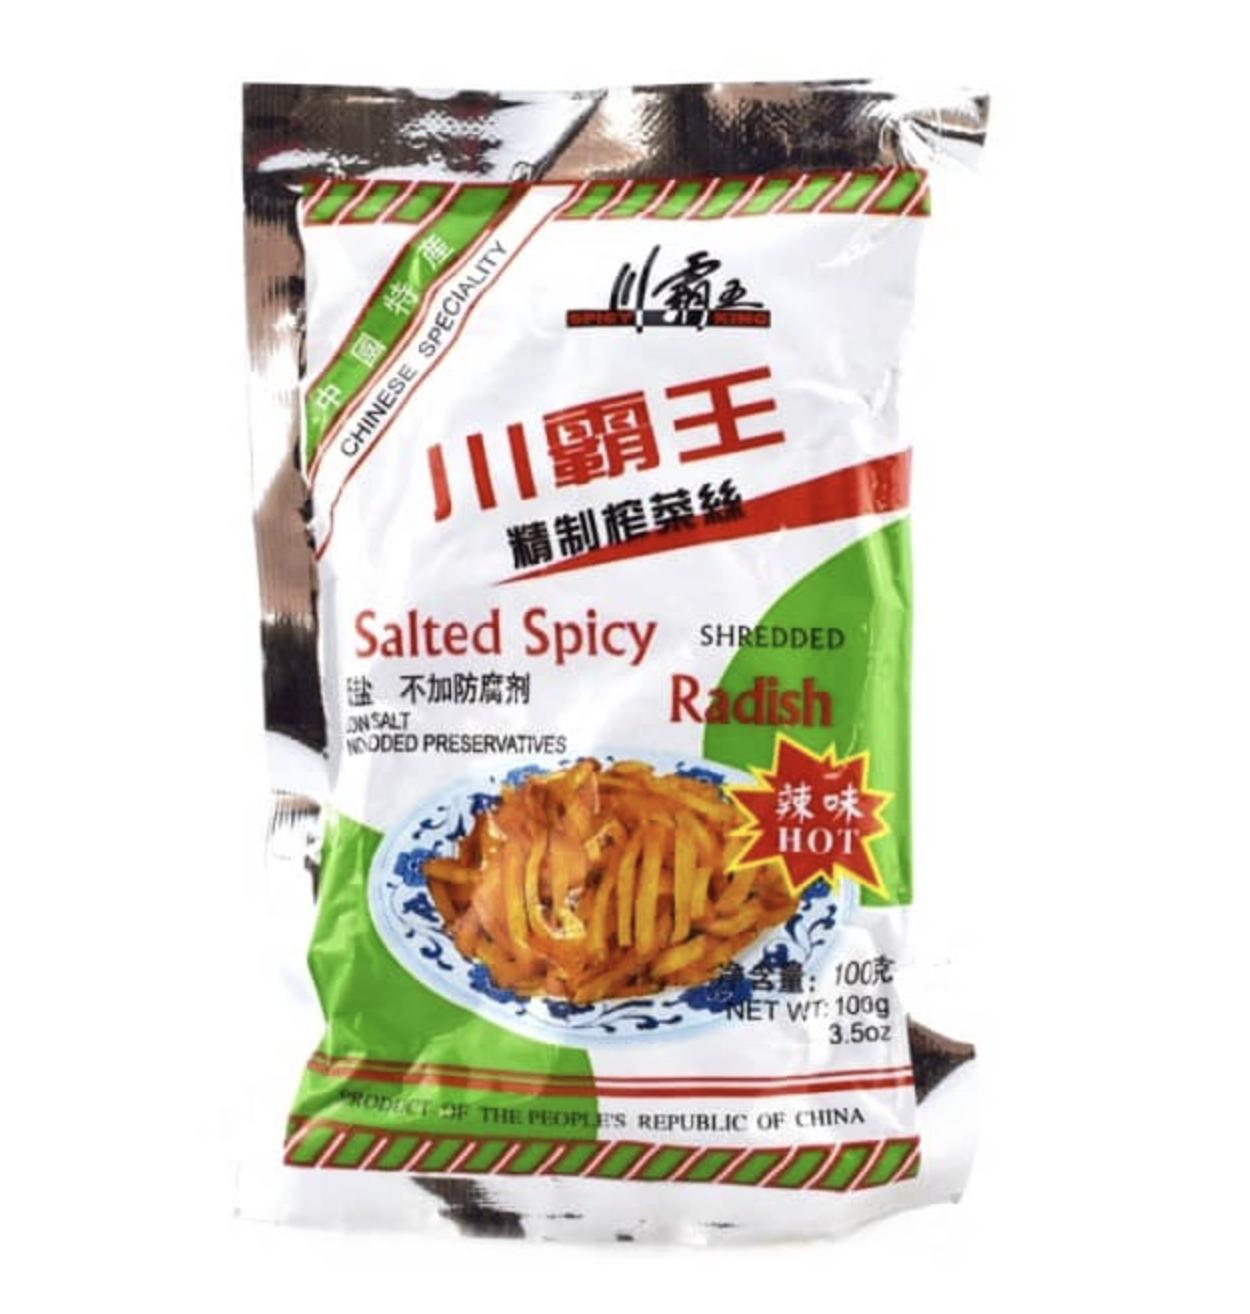 川霸王 精制榨菜丝 辣味 ~100g (3.5 oz) Salted spicy radish hot 100g (3.5 oz)